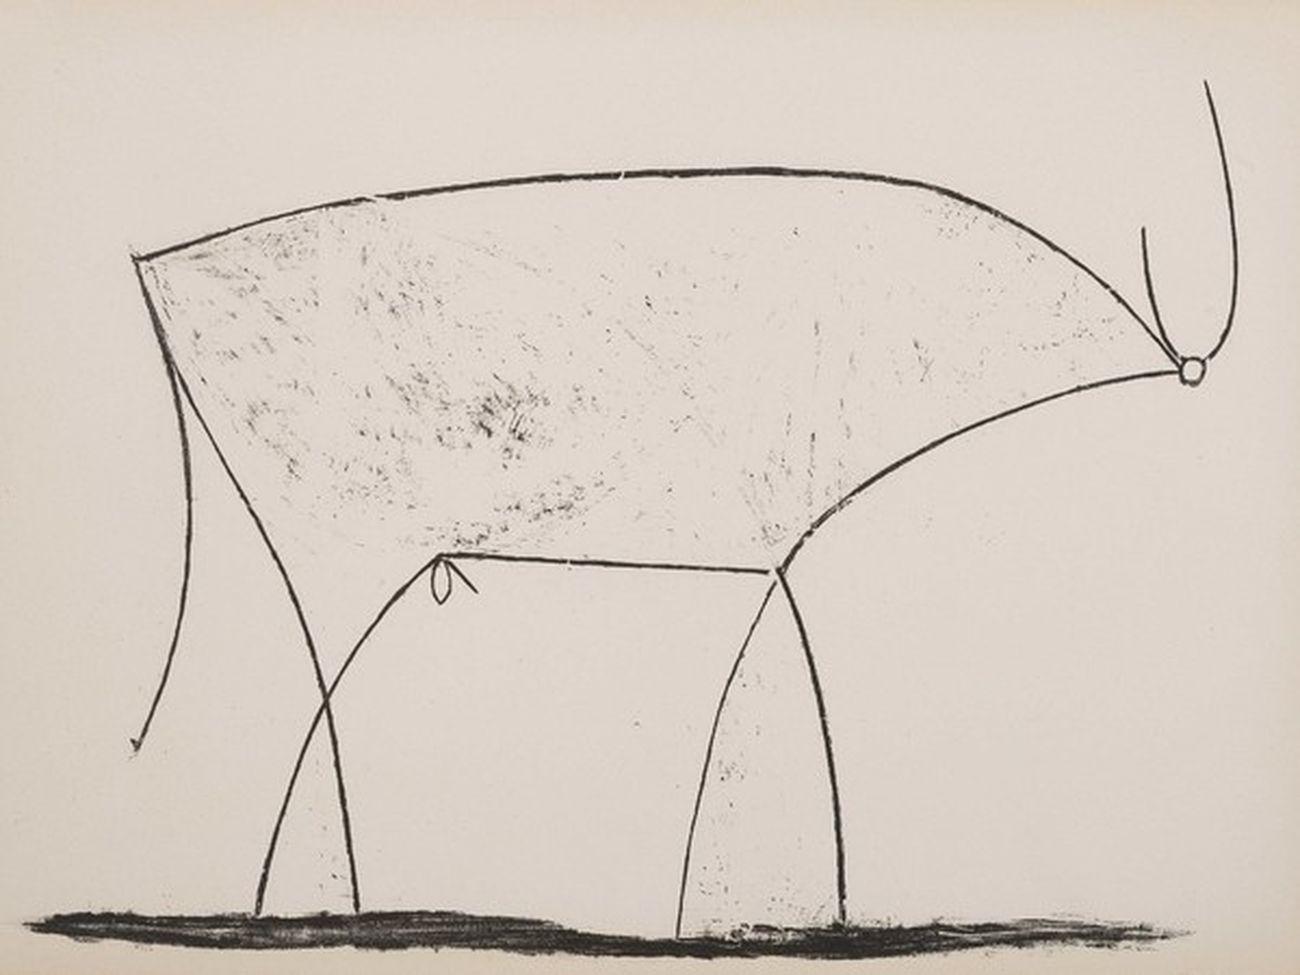 Pablo Picasso, Le taureau, 1945, litografia